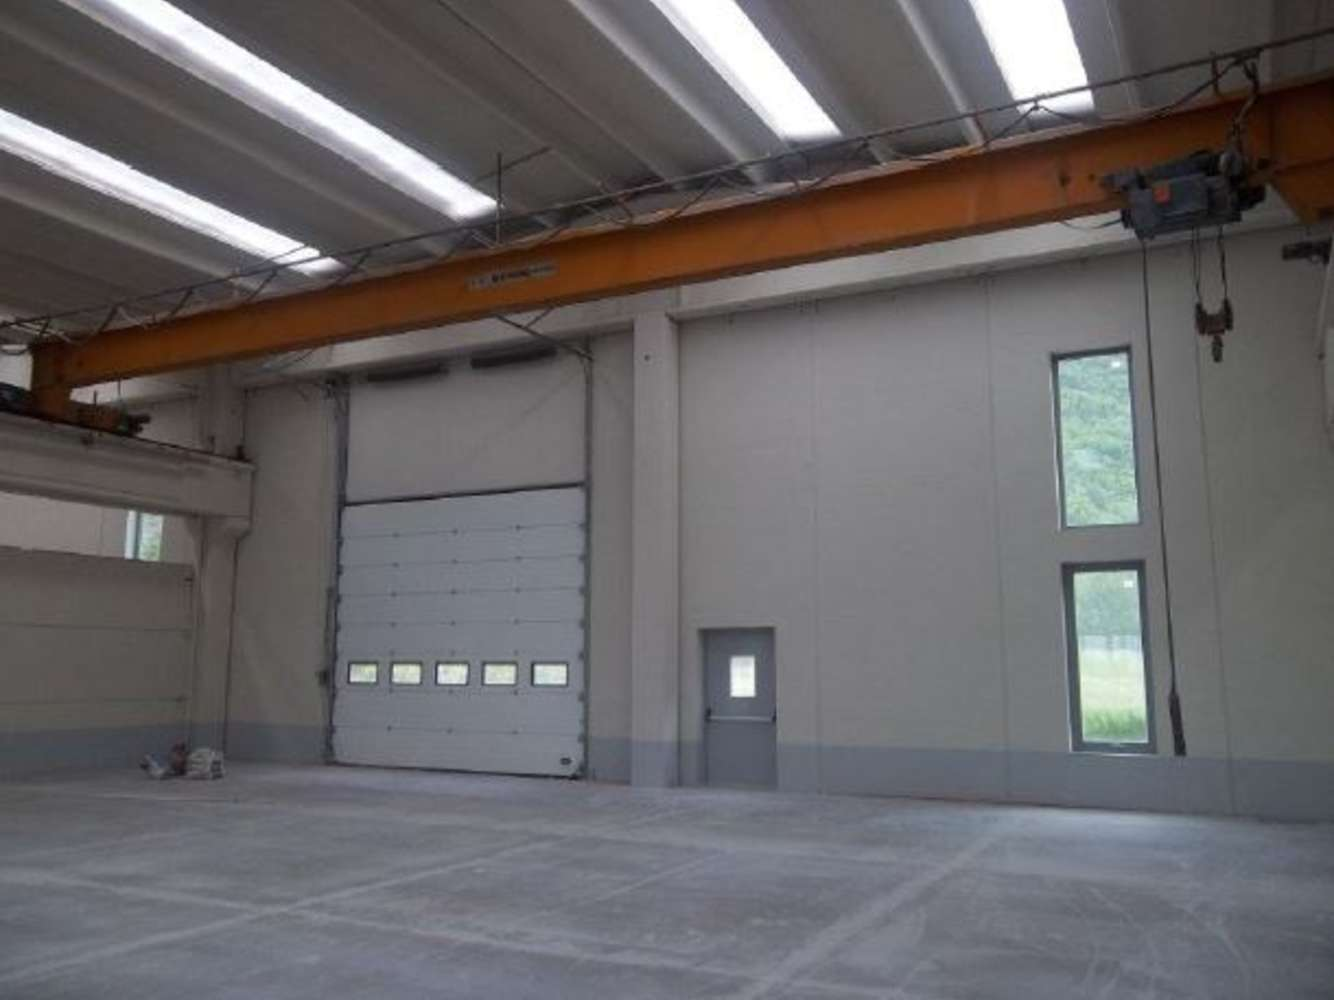 Magazzini industriali e logistici Issogne, 11020 - Capannoni logistici e uffici Aosta - 10033599